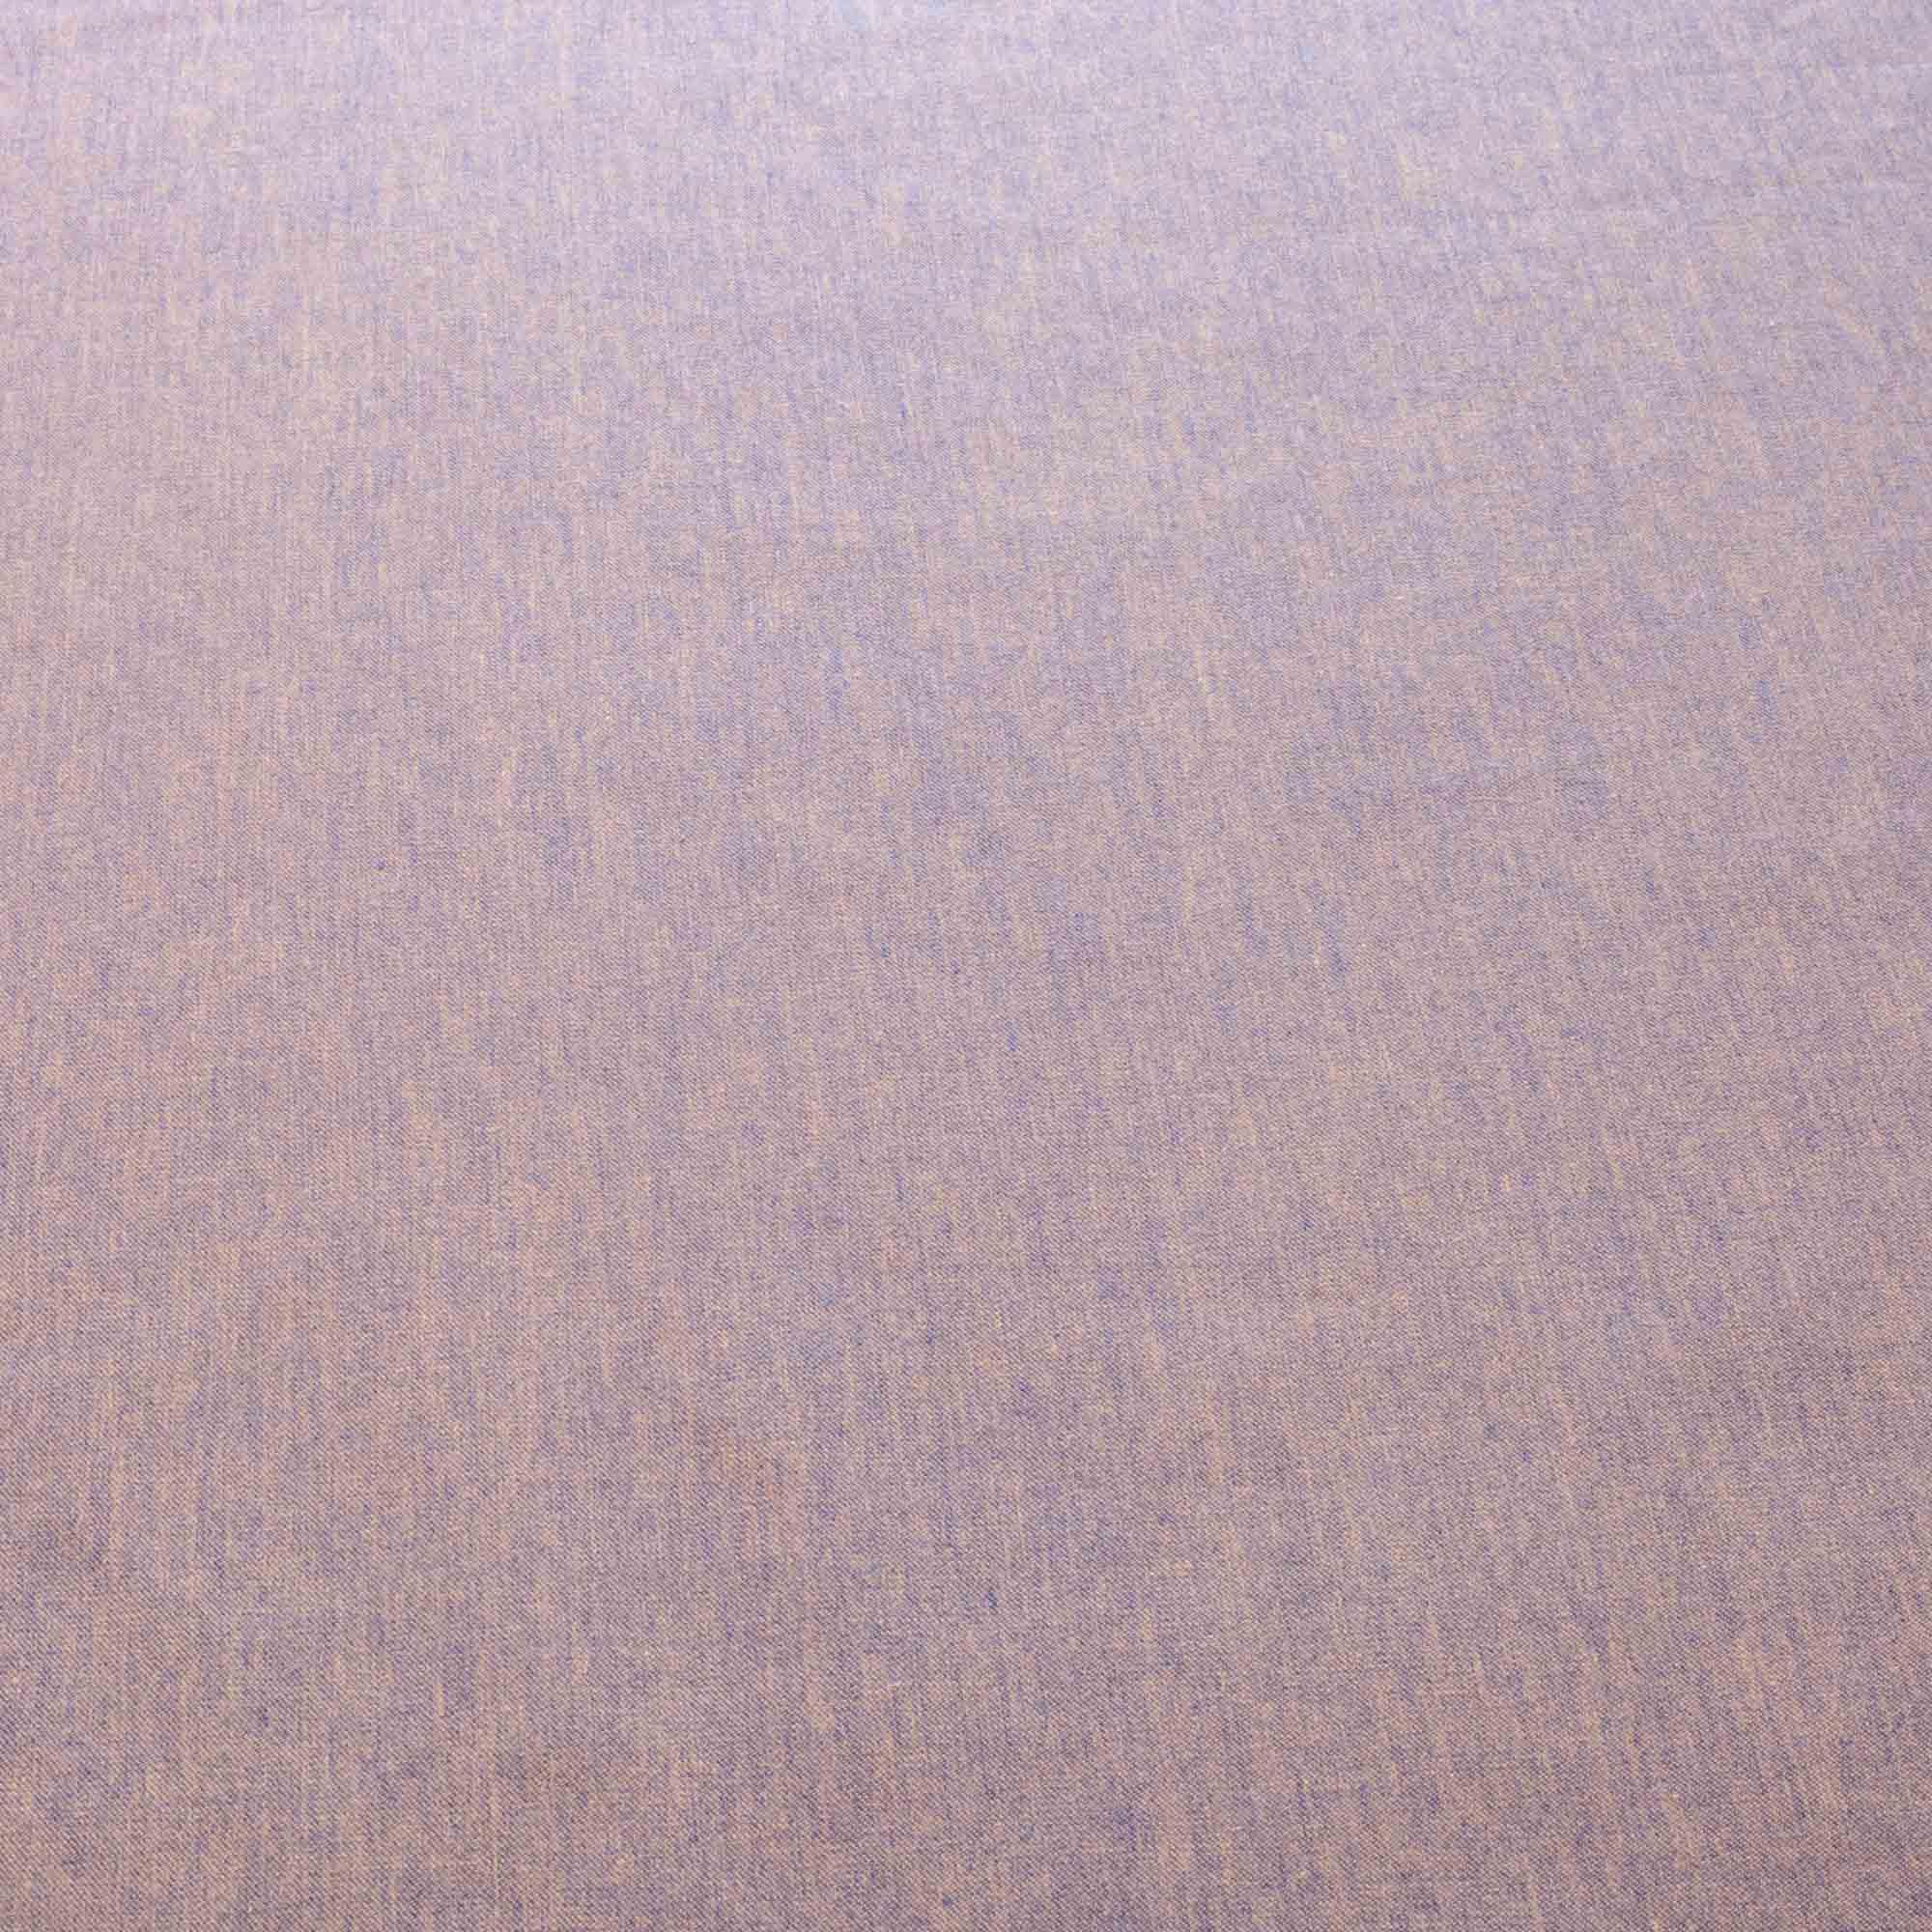 Tecido Chambray Jeans Leve Azul 100% Algodão 1,50 m Largura